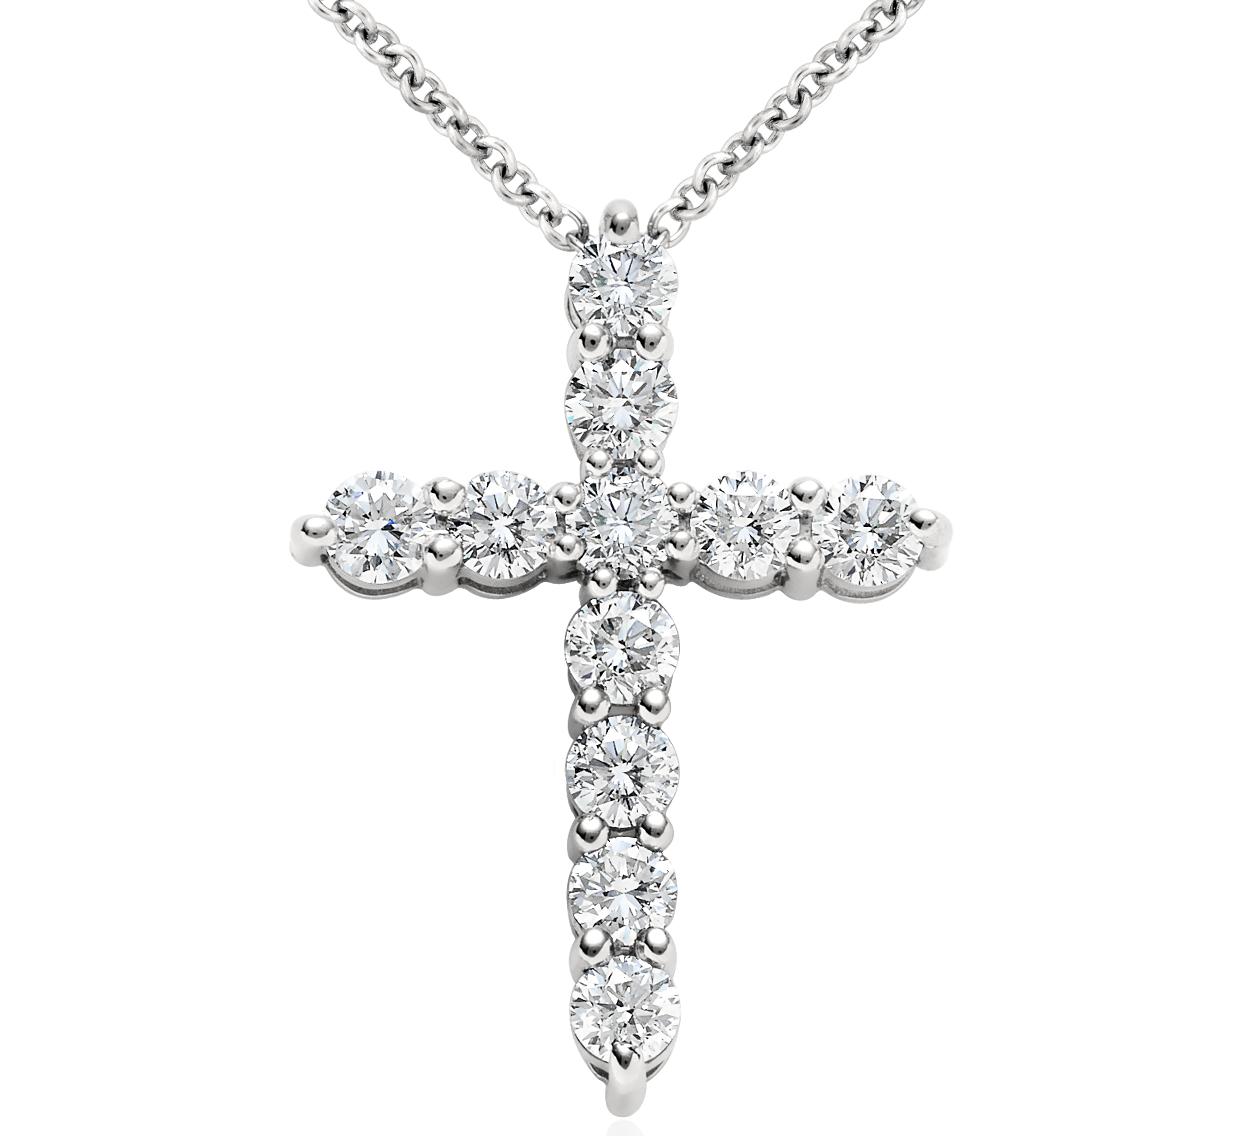 Pendentif croix diamant en platine (1carat, poids total)